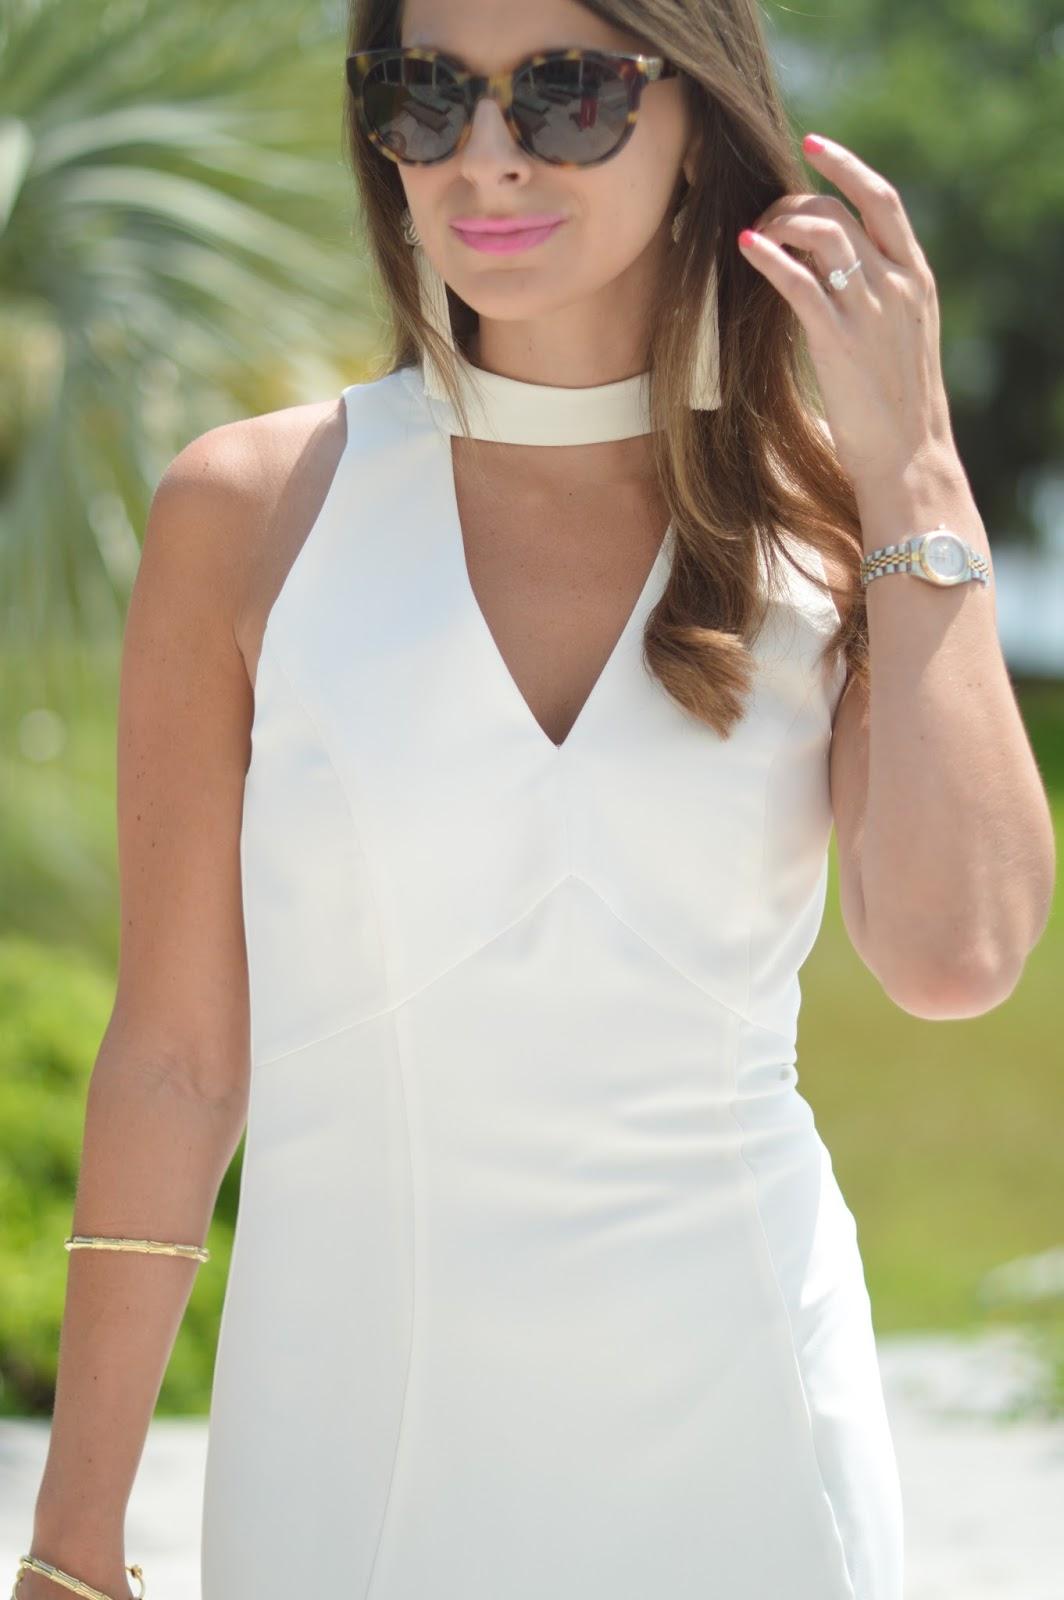 Flirty White Dress Southern Style A Life Style Blog